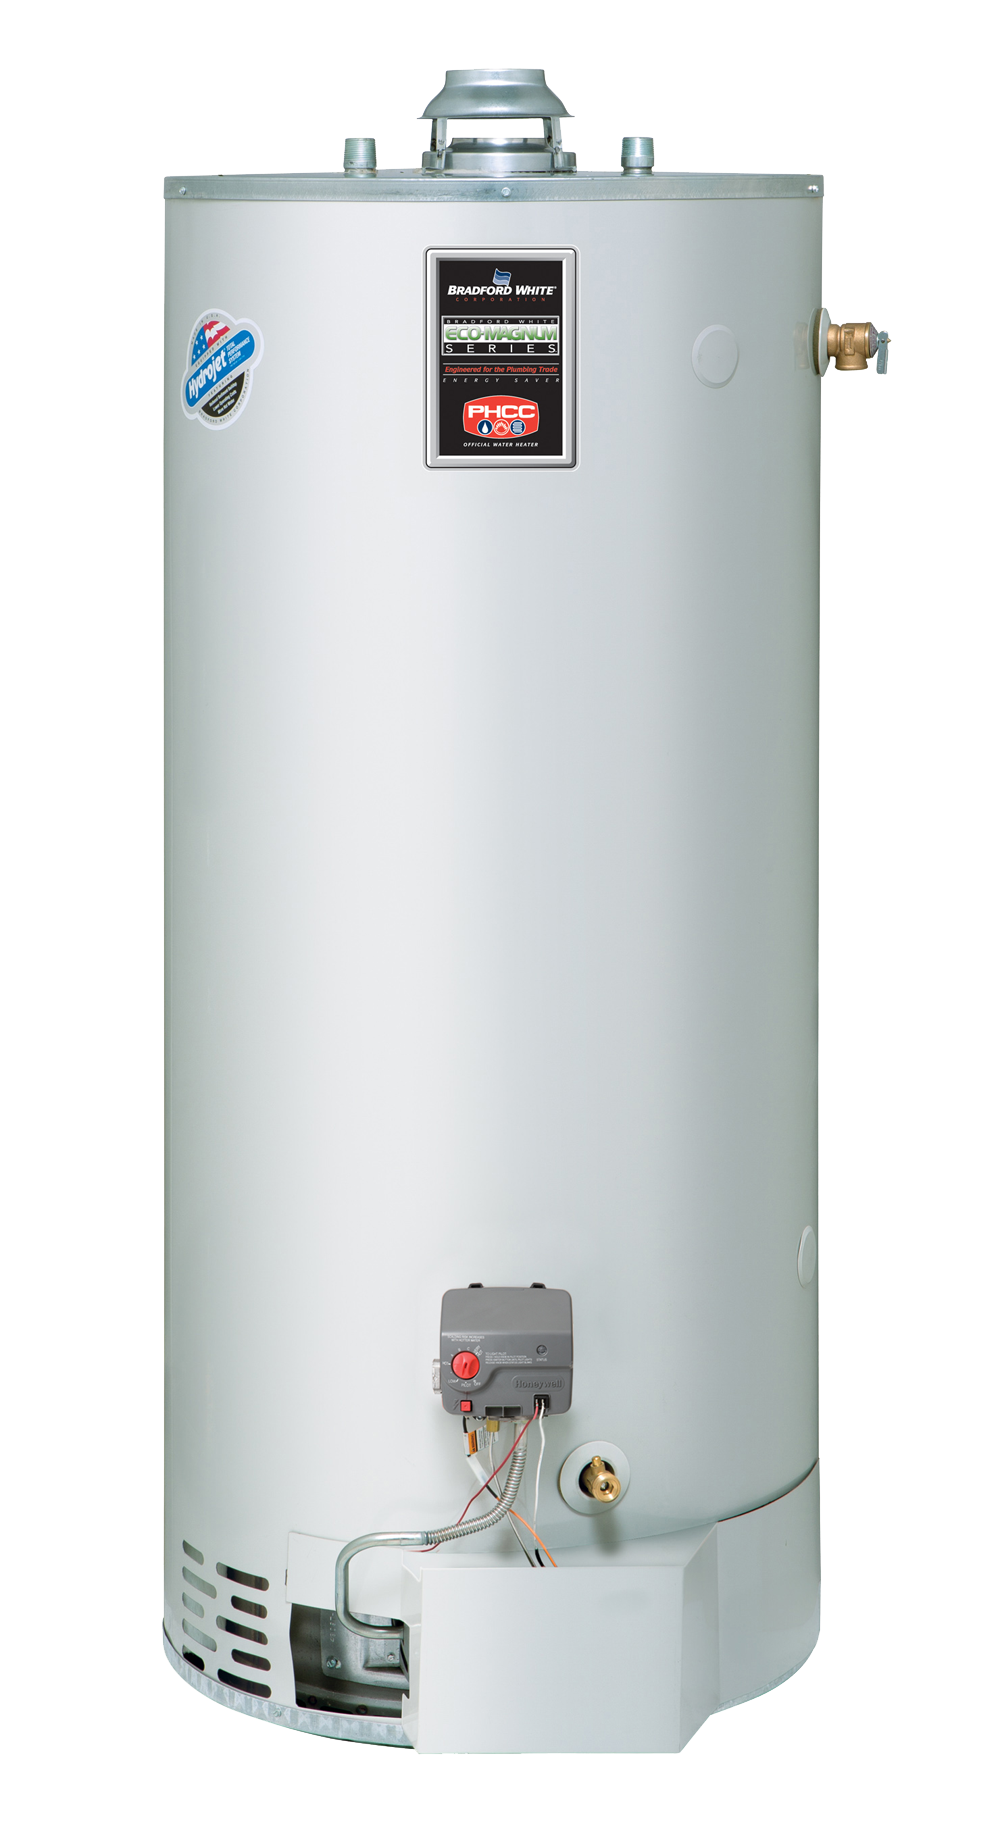 Hot Water Tank Installation Water Heaters Repair Maintenance And Installation In Northfield